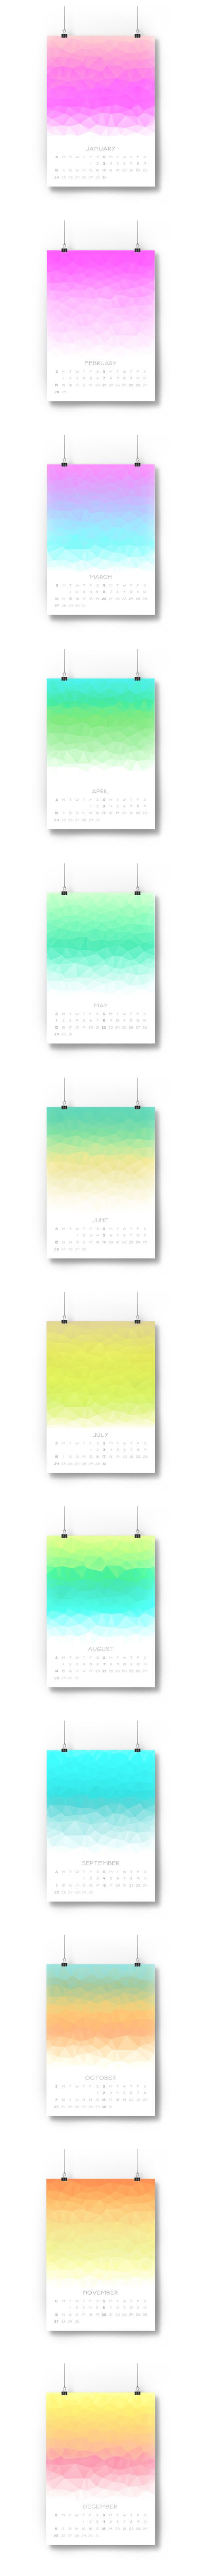 2016 Polygons Calendar — Vanessa Quijano #2016 #calendar #giftideas